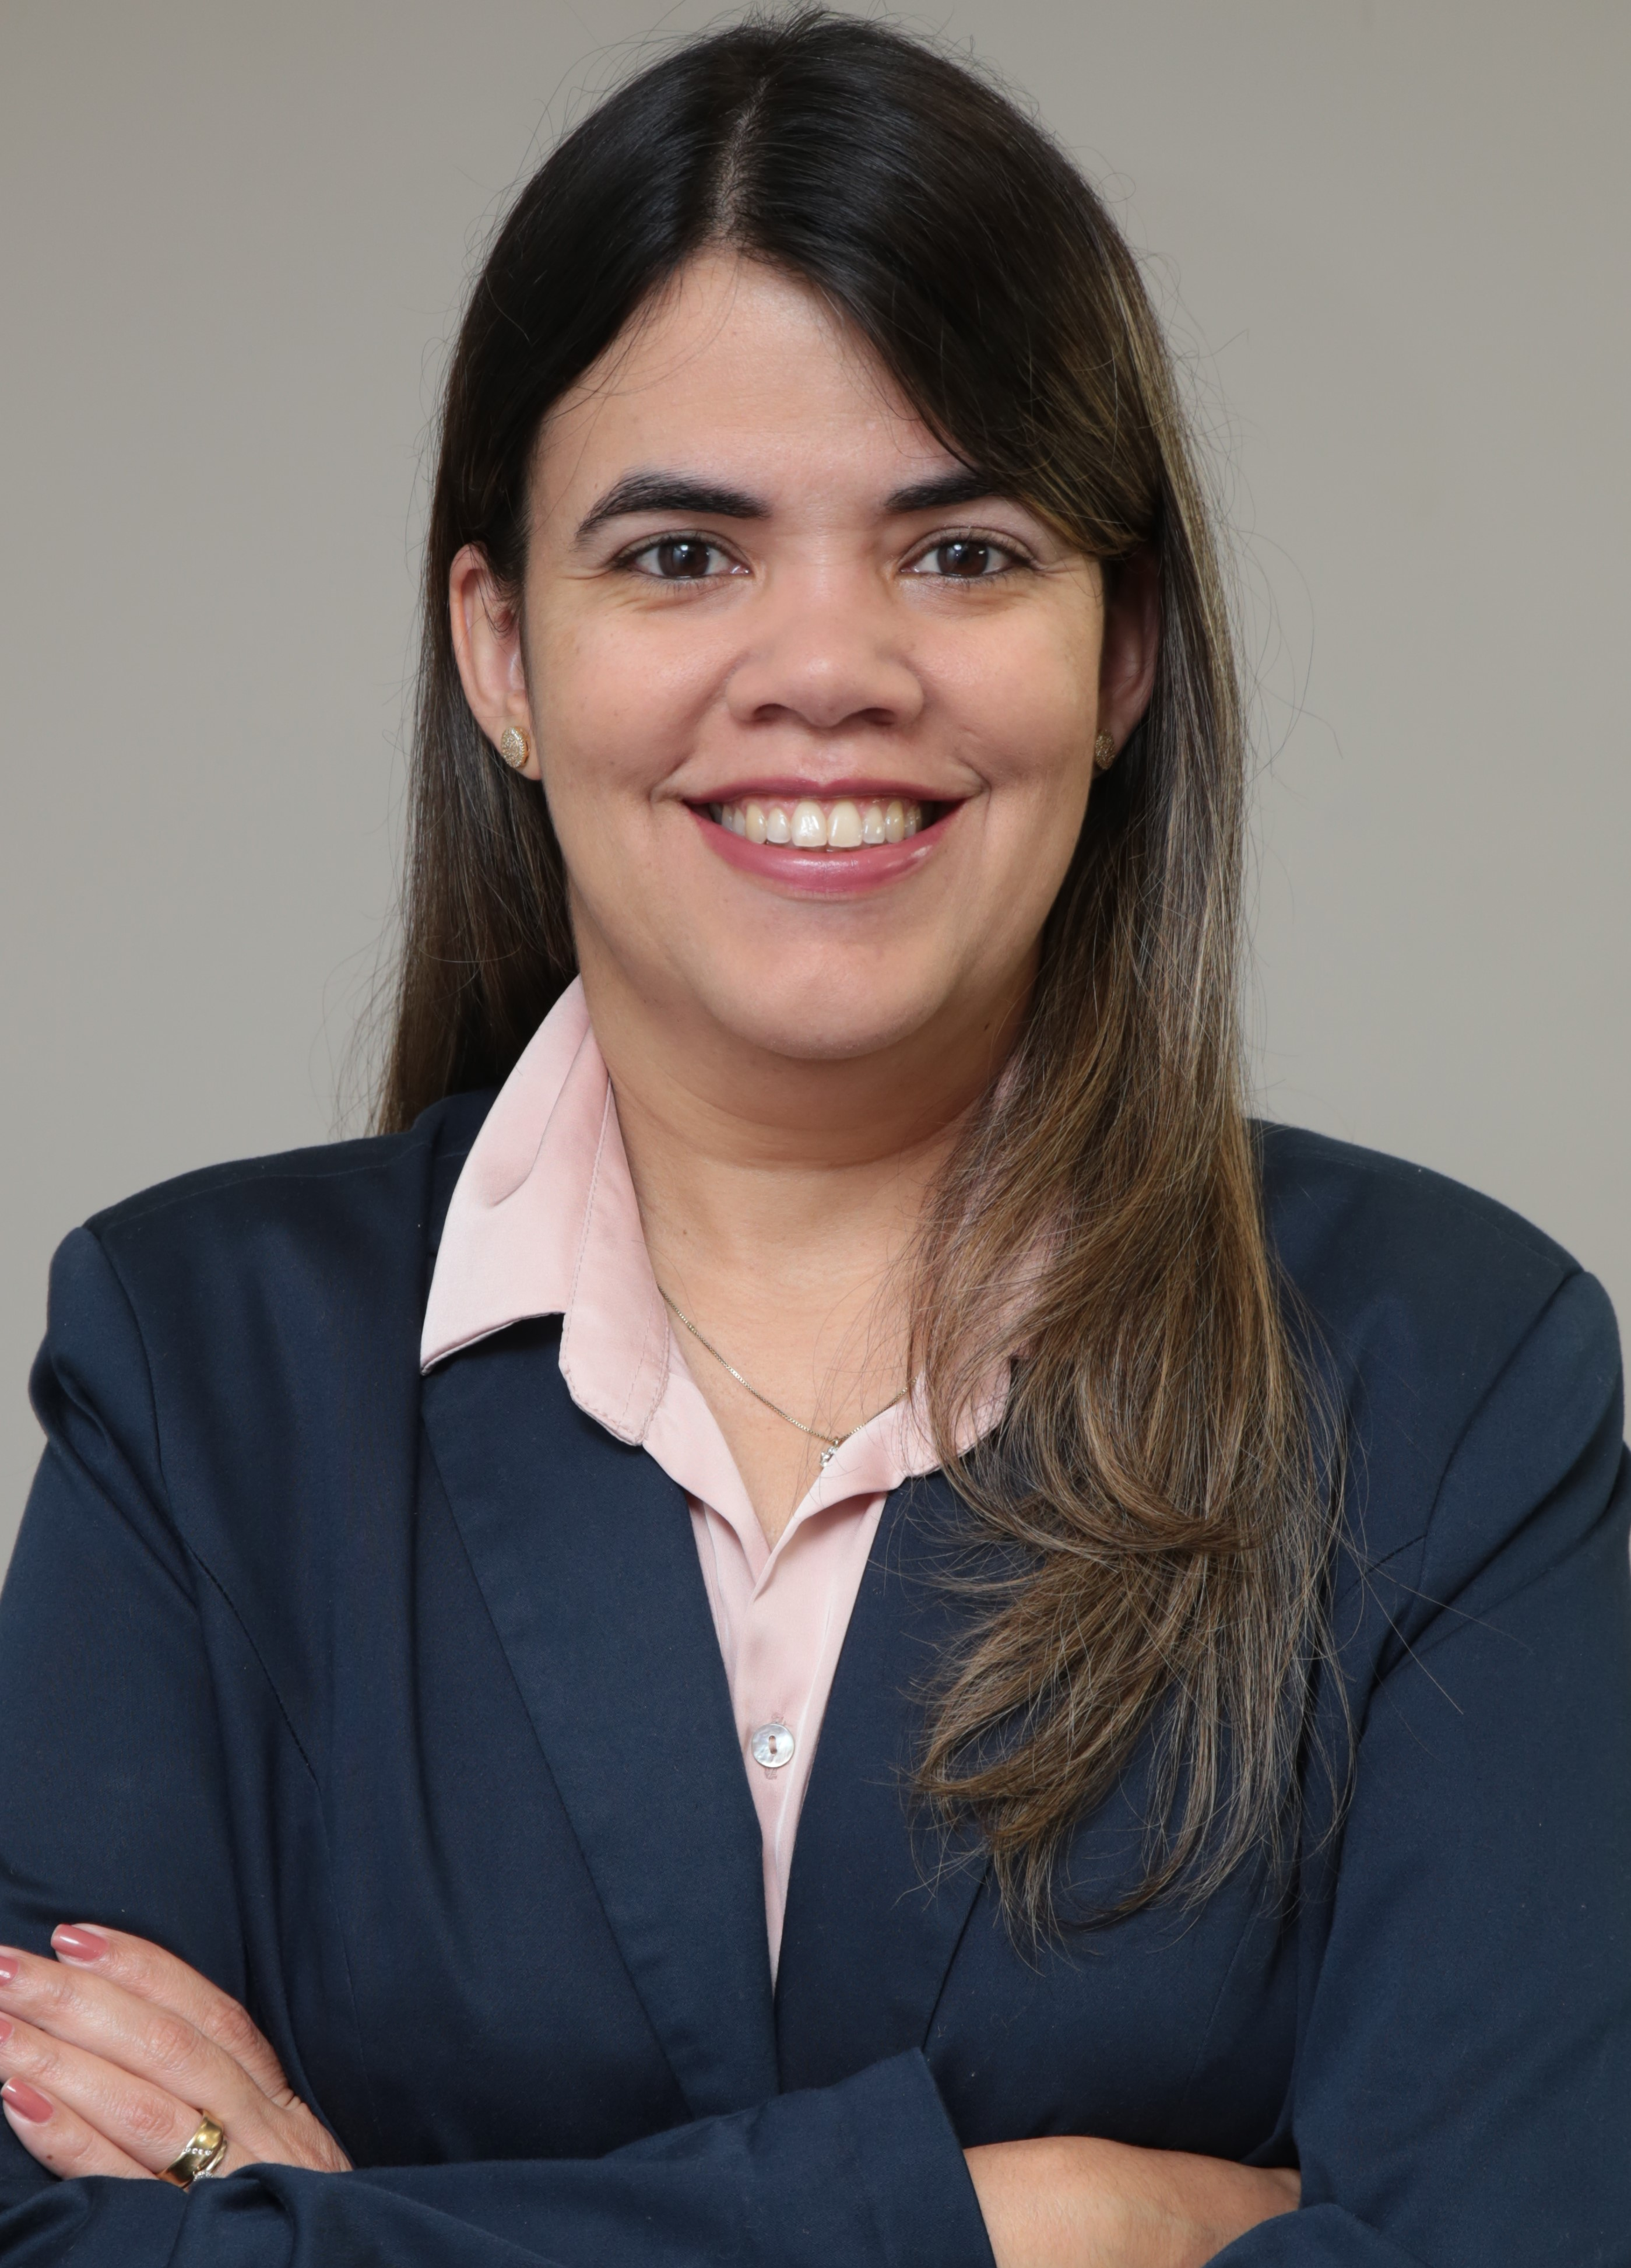 Renata de Lima Pereira